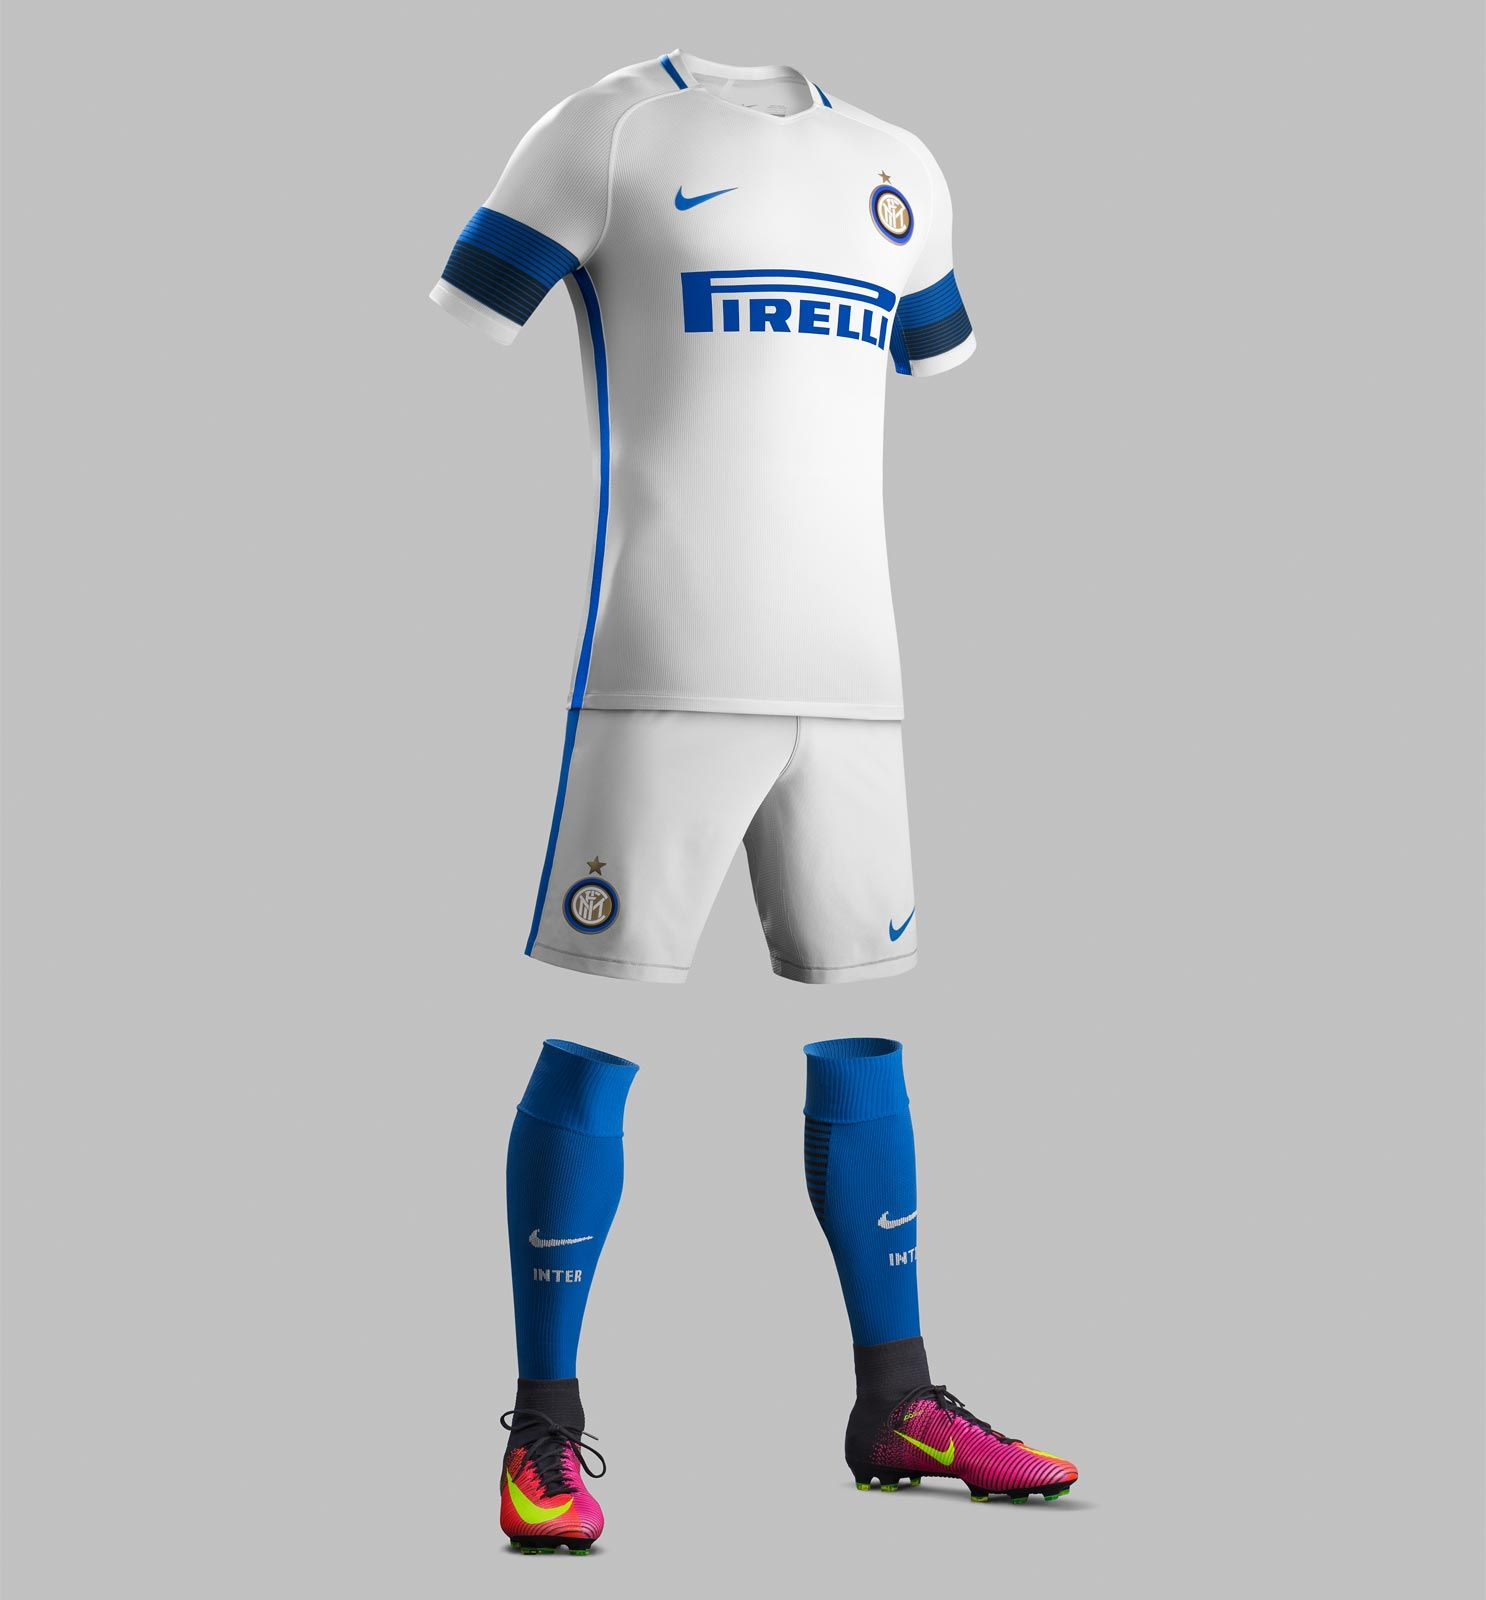 FC Internazionale Milano (Italy) - 2016/2017 Nike Away Kit